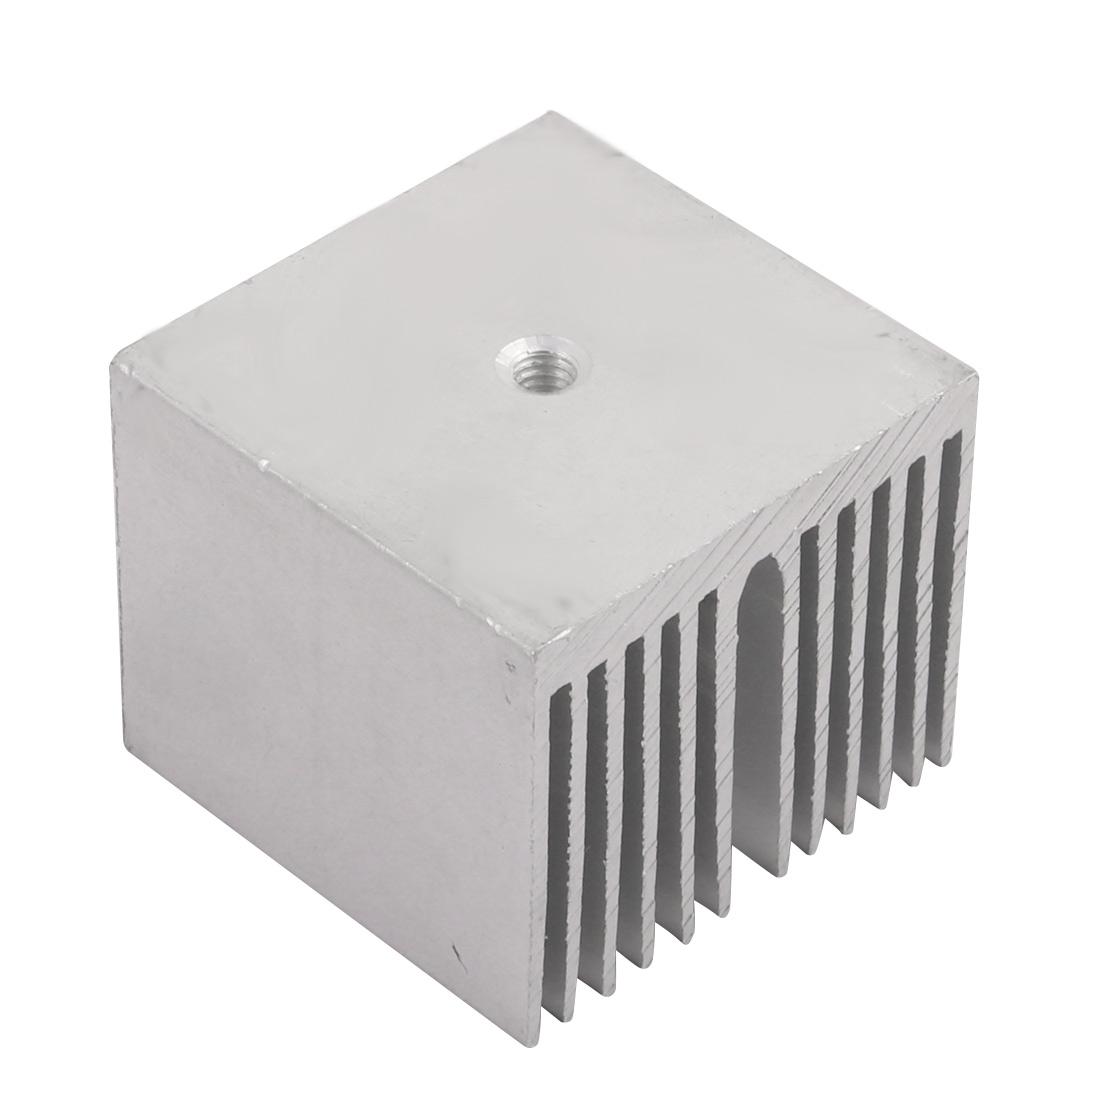 35mm x 35mm x 30mm Aluminum Heatsink Radiator Cooling Fin Silver Tone